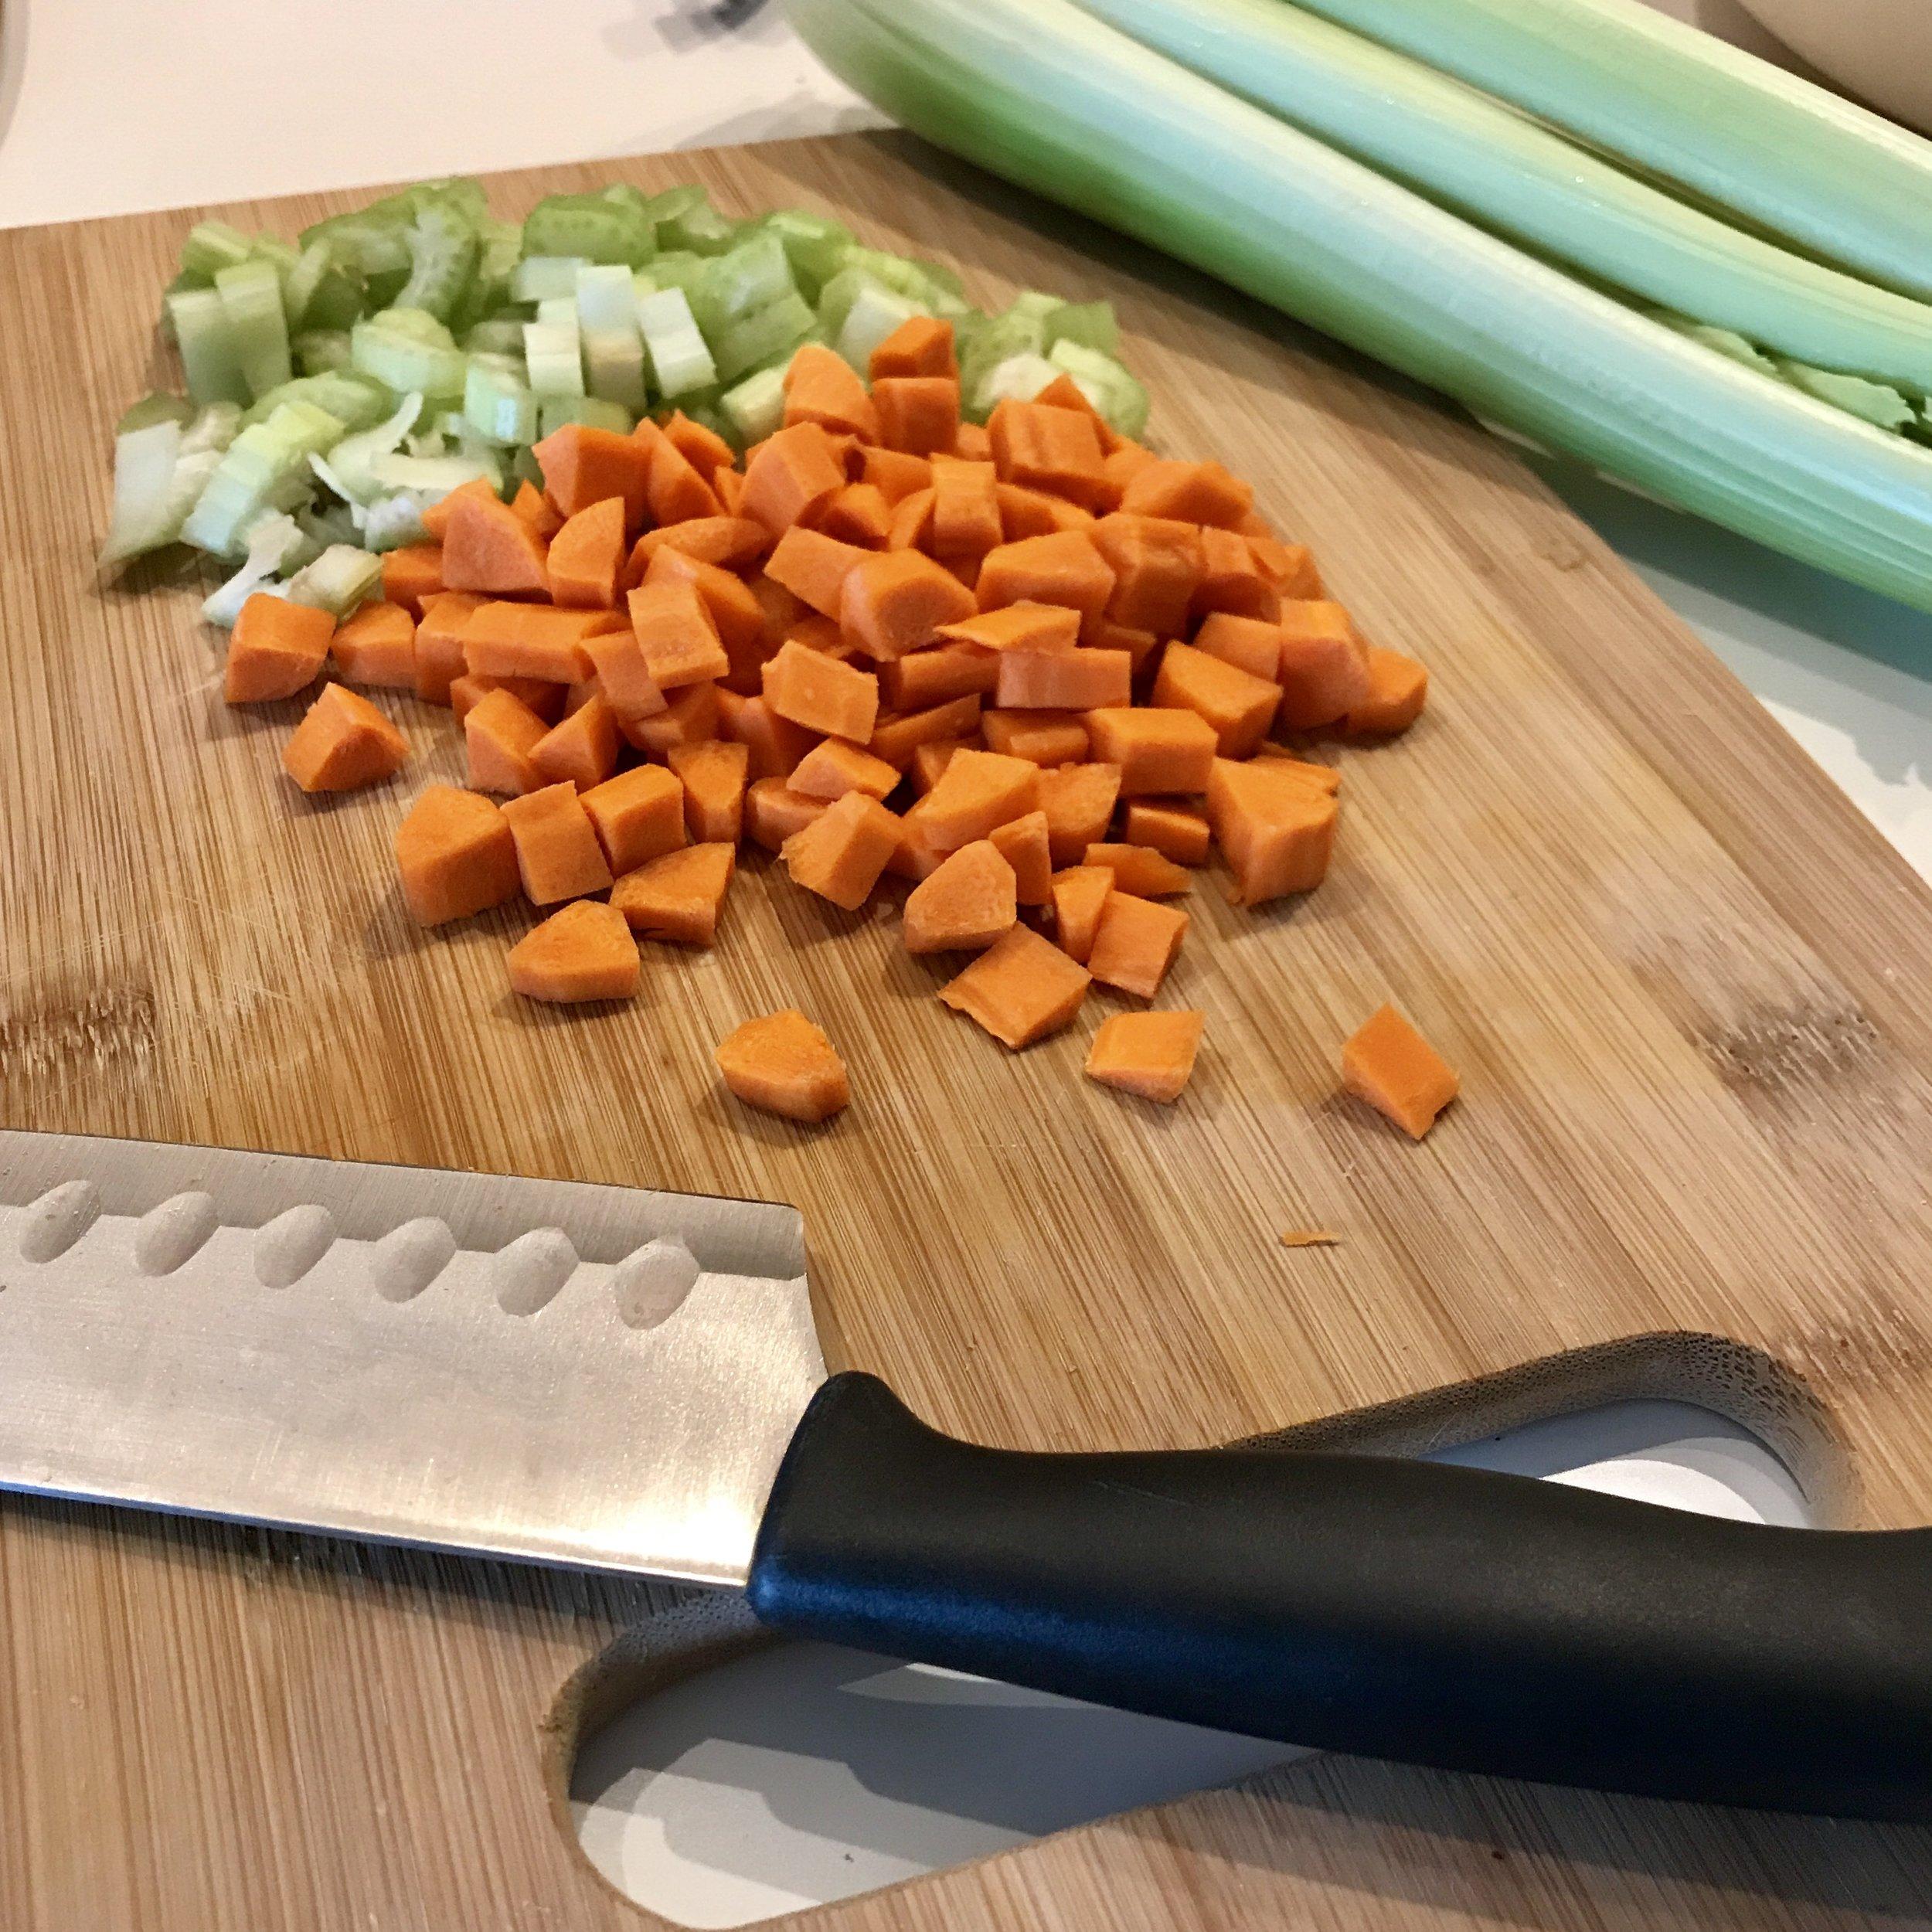 Chopping Vegetables.JPG